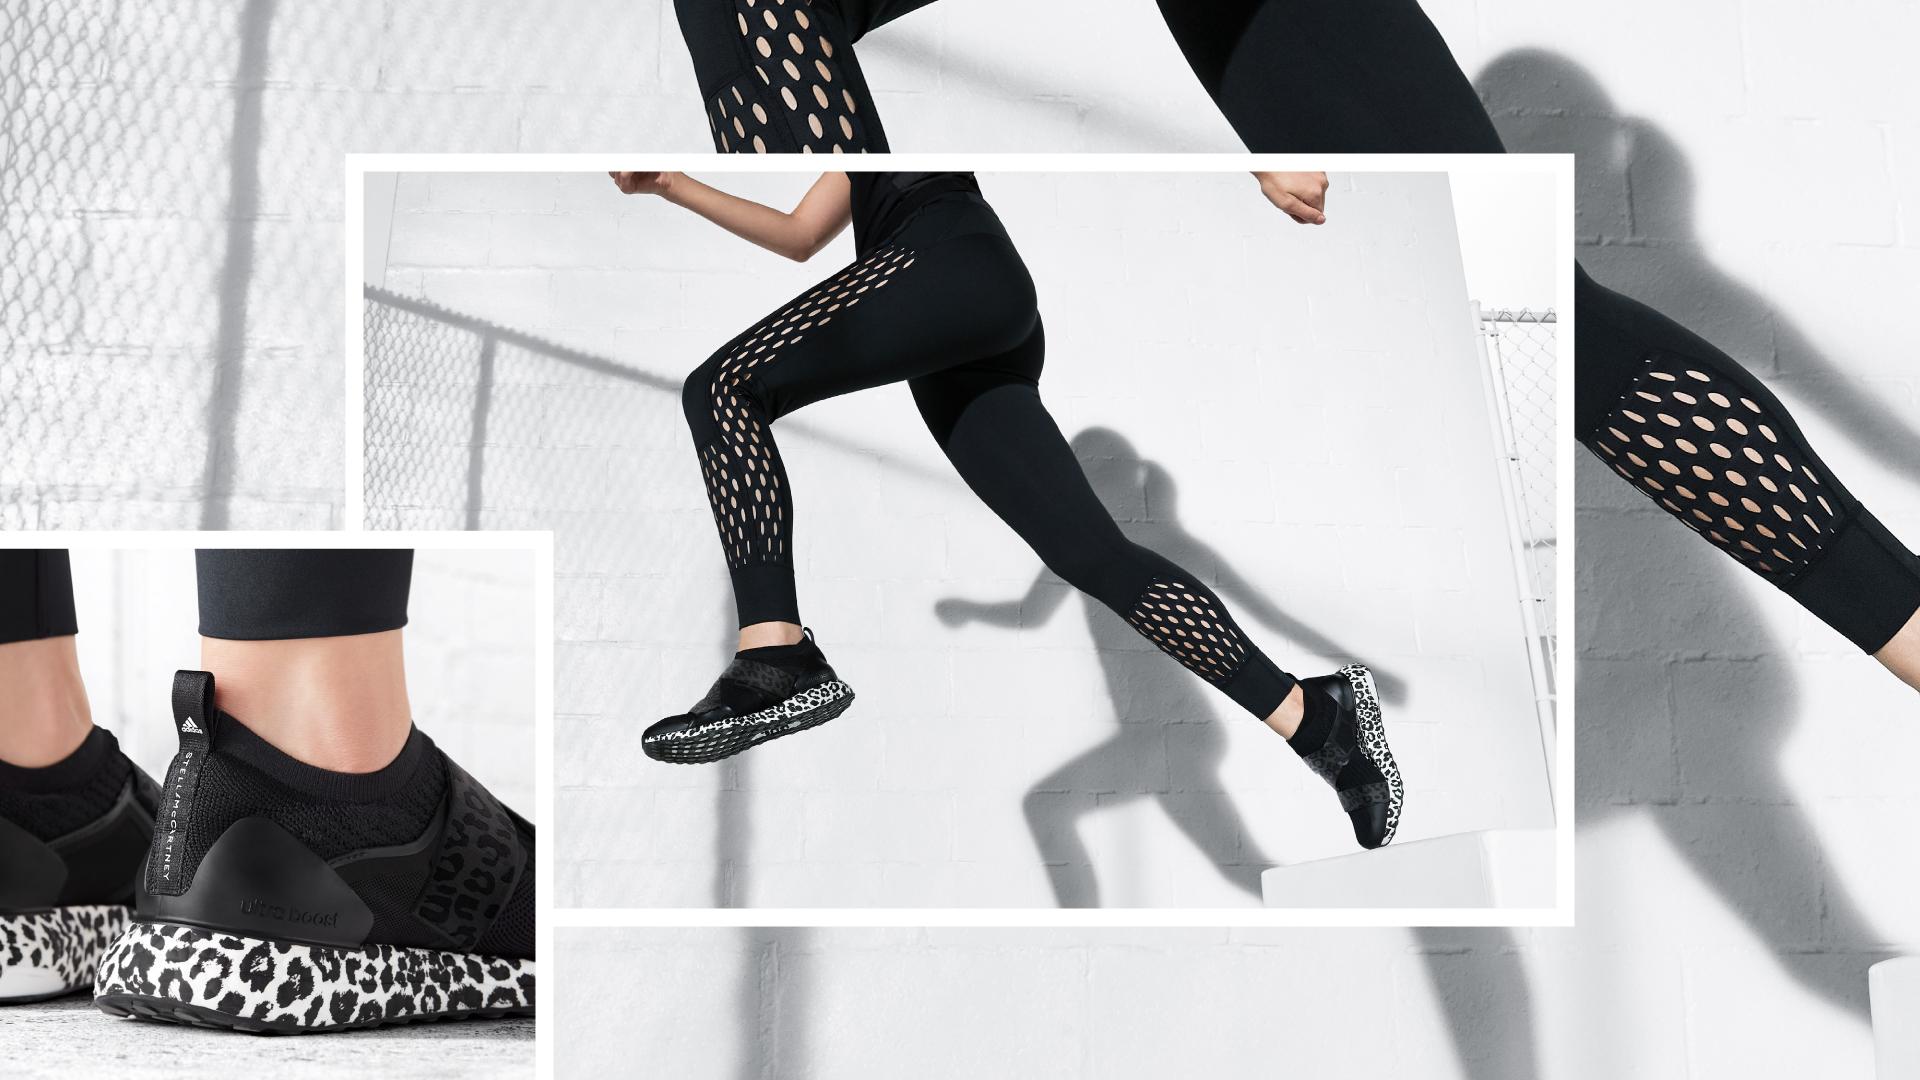 adidas-stella-mccartney-cgi-post-production4